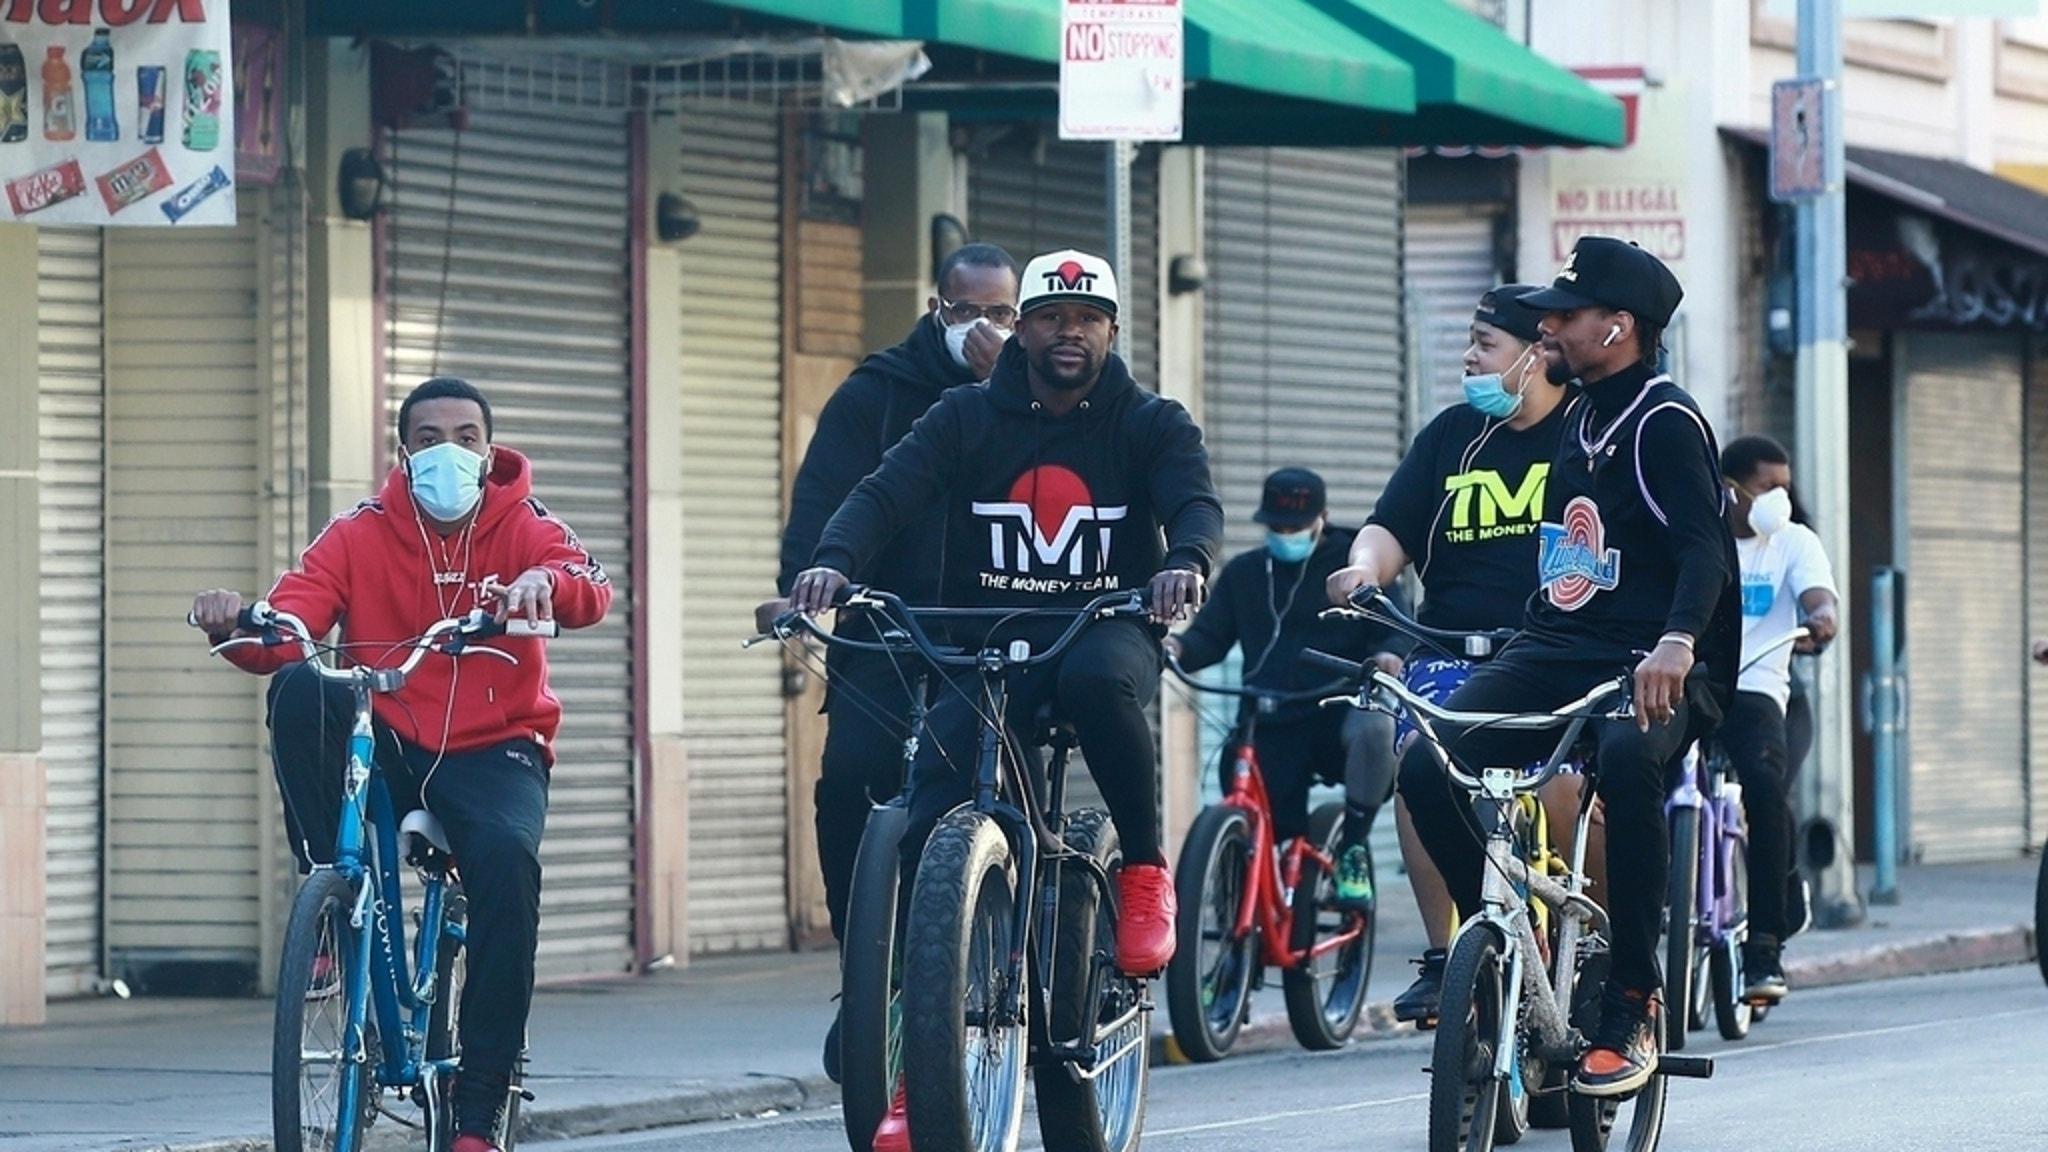 Floyd Mayweather Bikes Through L.A. W/ Huge Entourage, Social Distancing Foul? - EpicNews